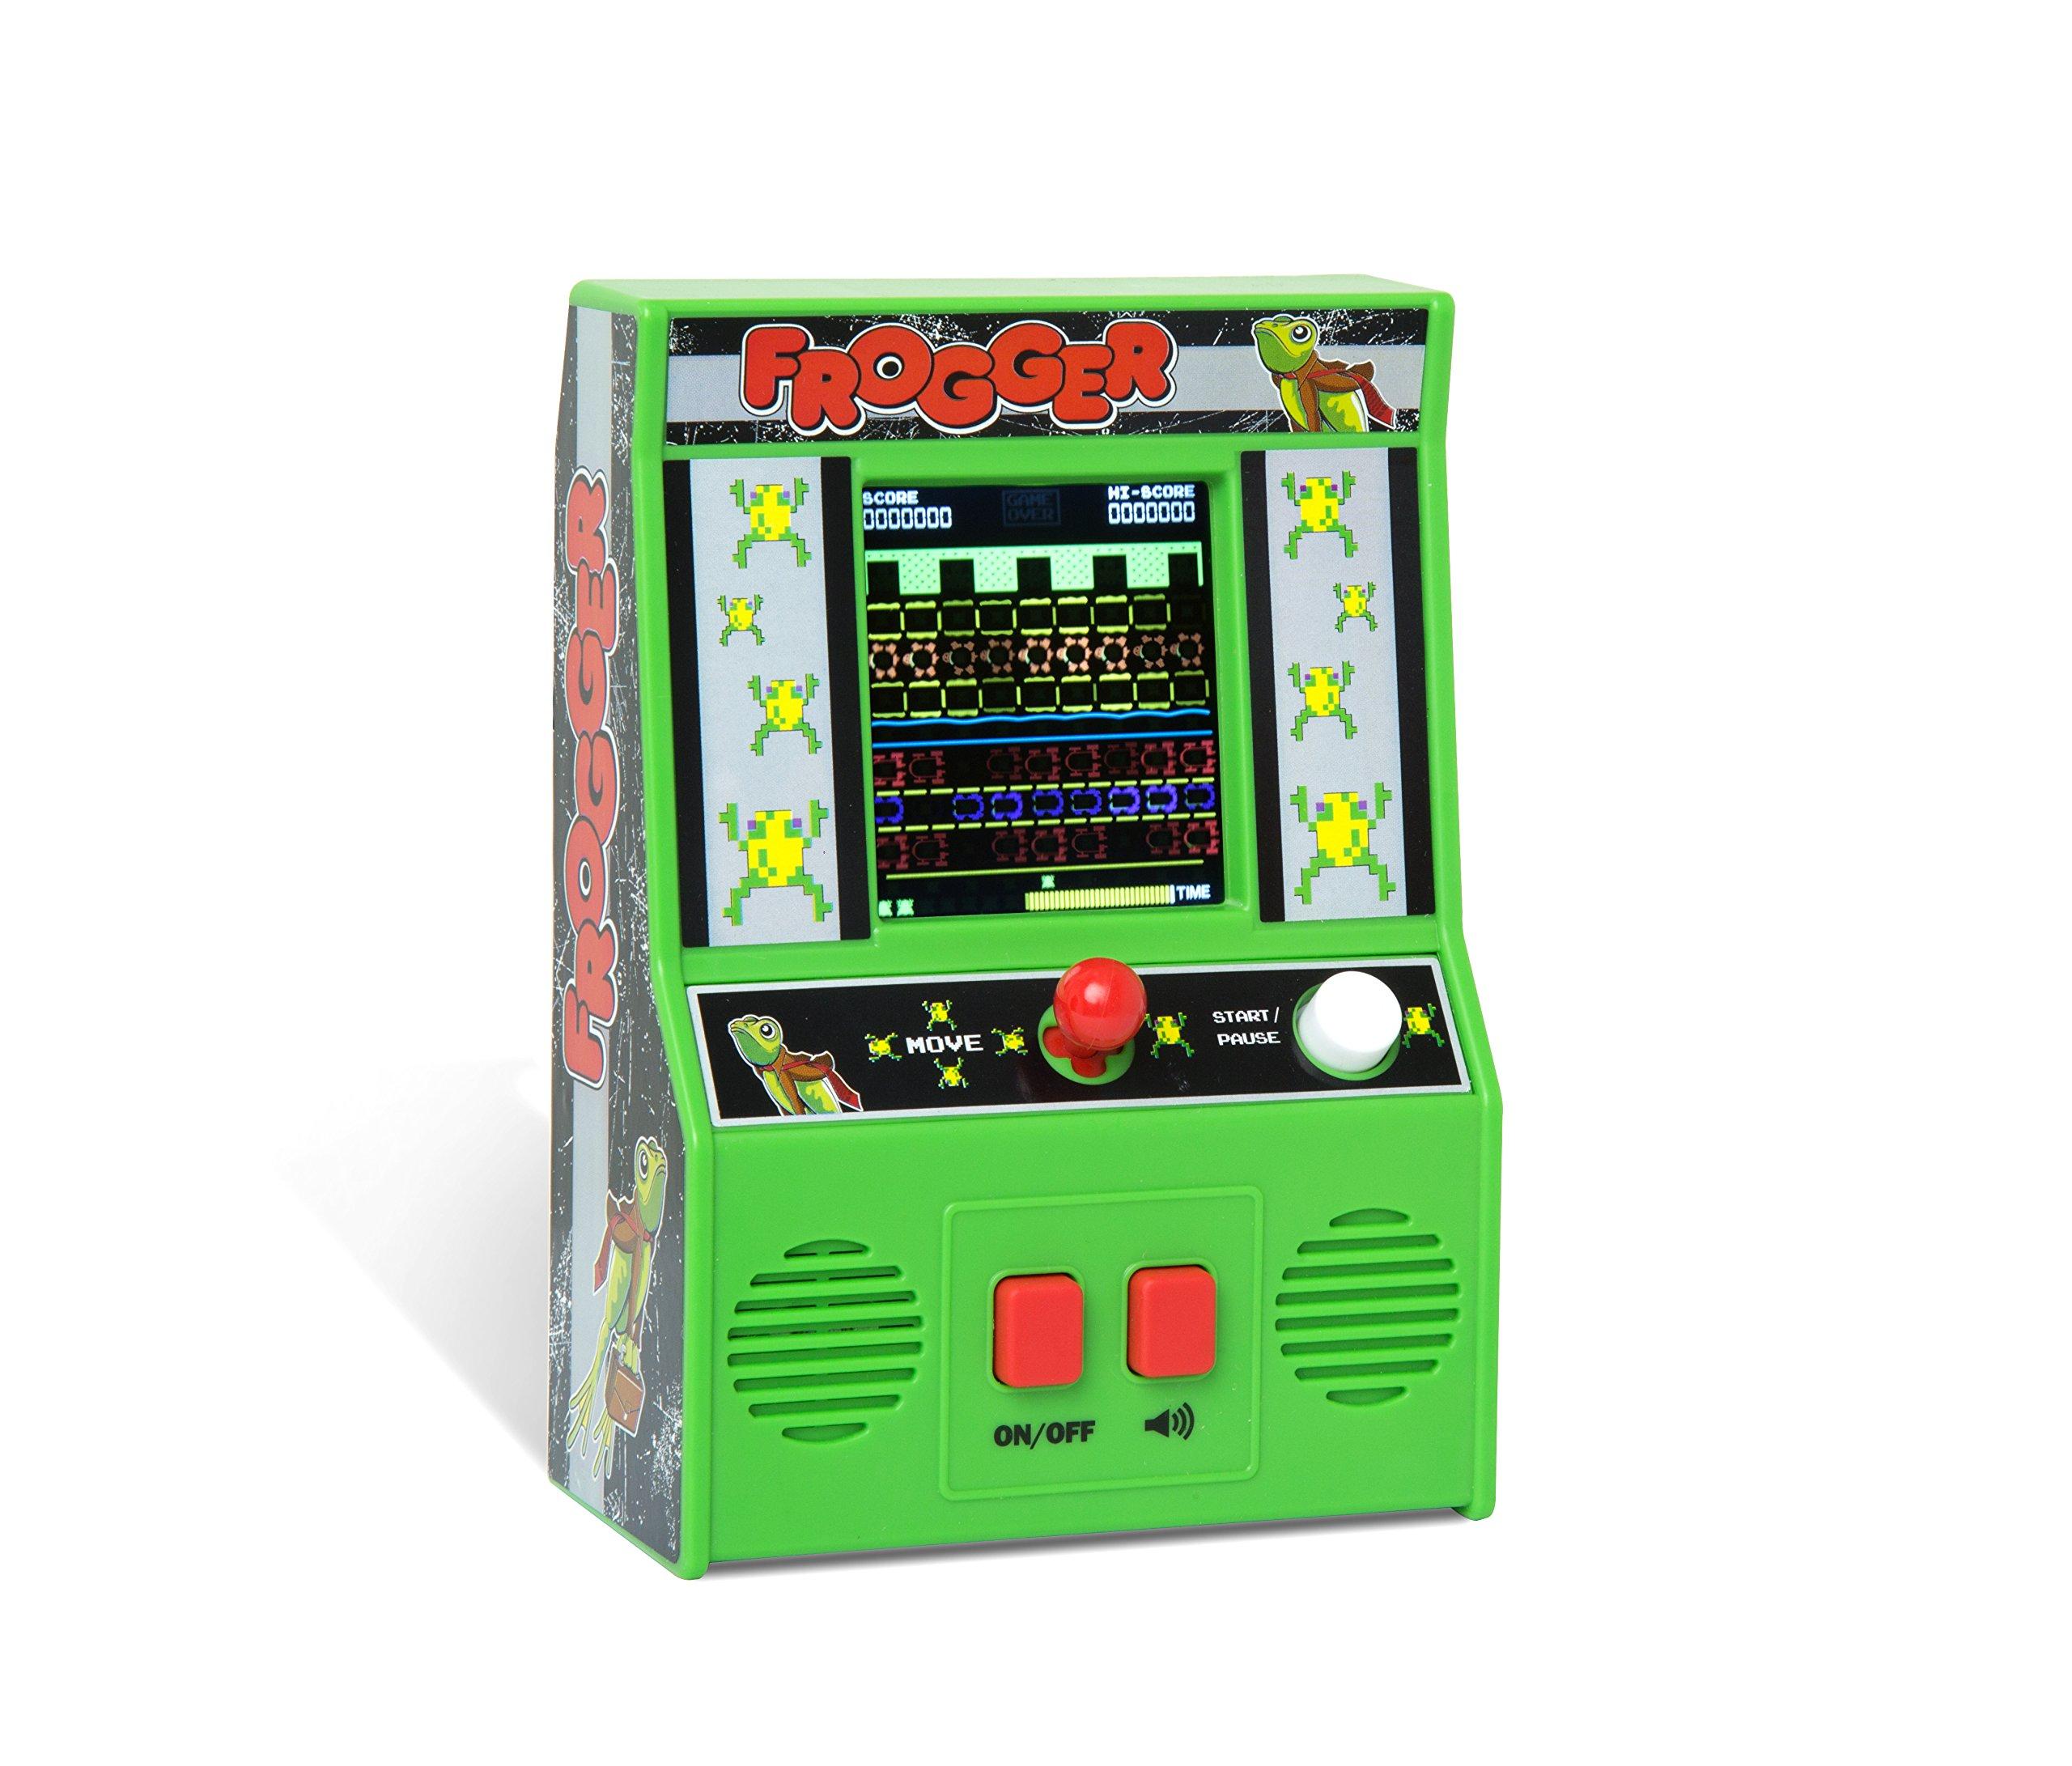 Basic Fun Arcade Classics - Frogger Retro Handheld Arcade Game